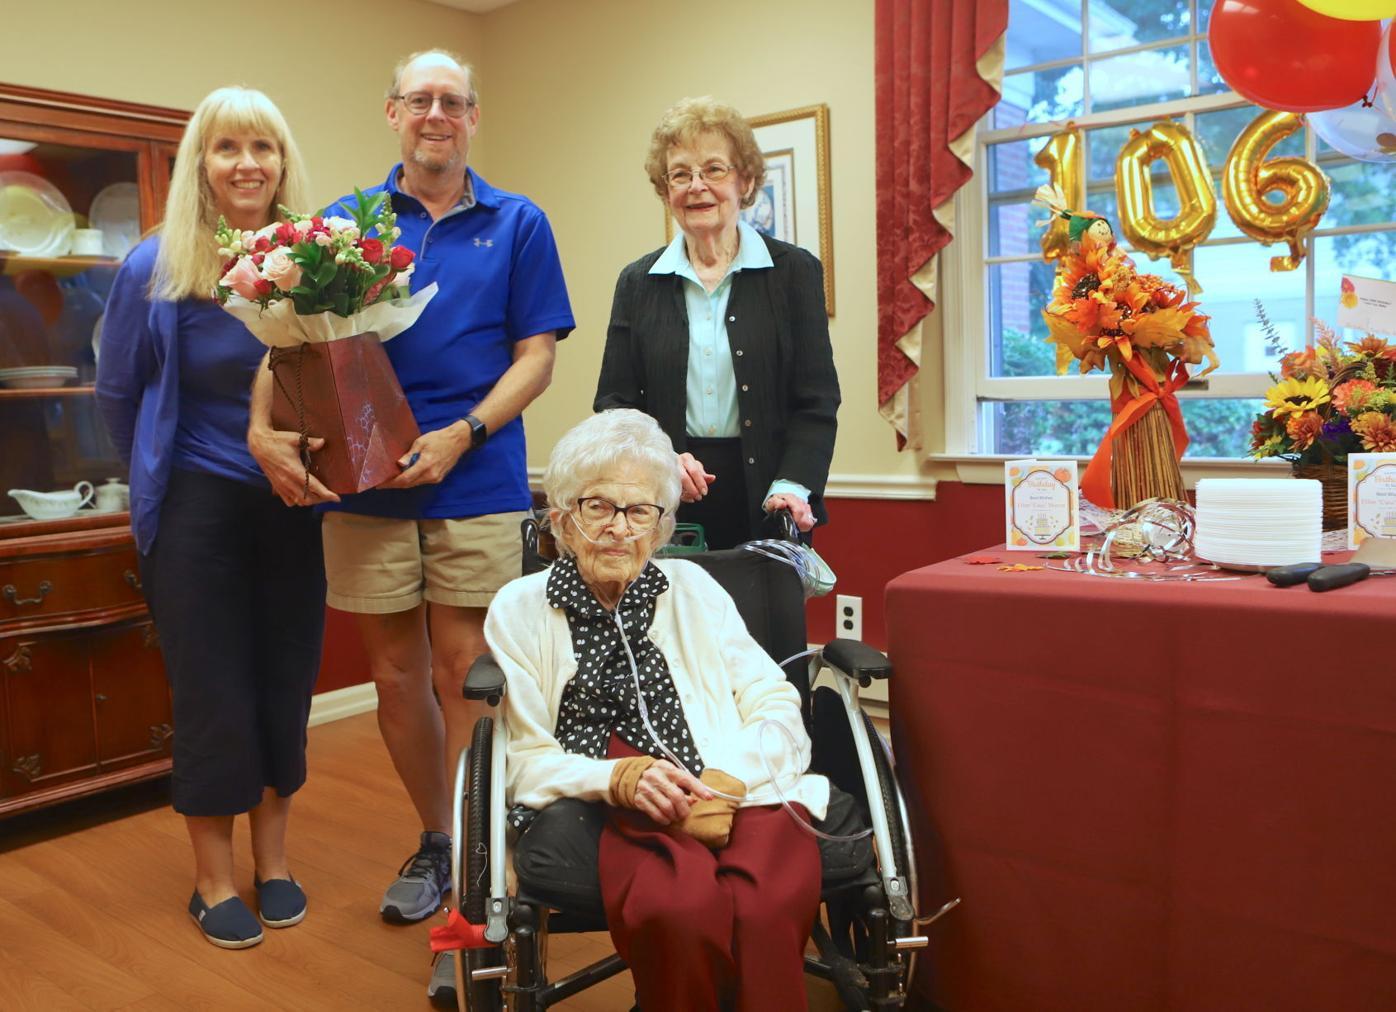 106th birthday